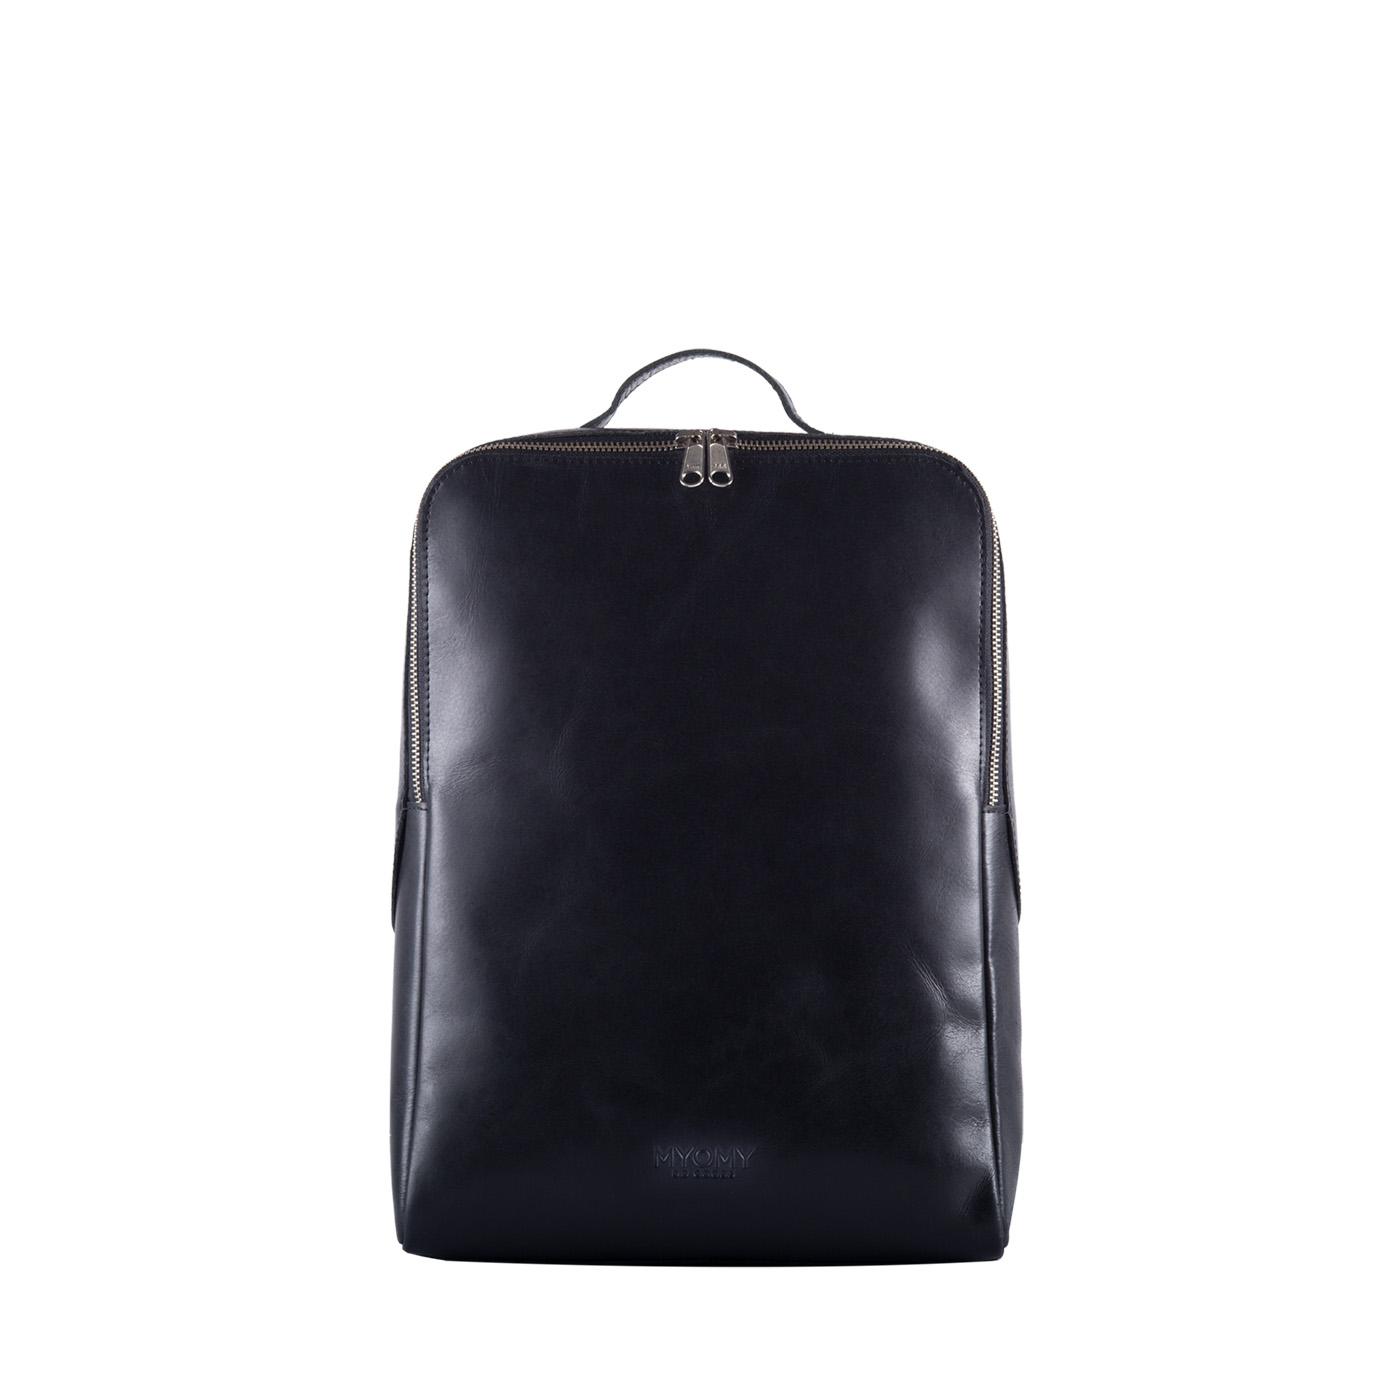 MY GYM BAG Back bag – hunter waxy black